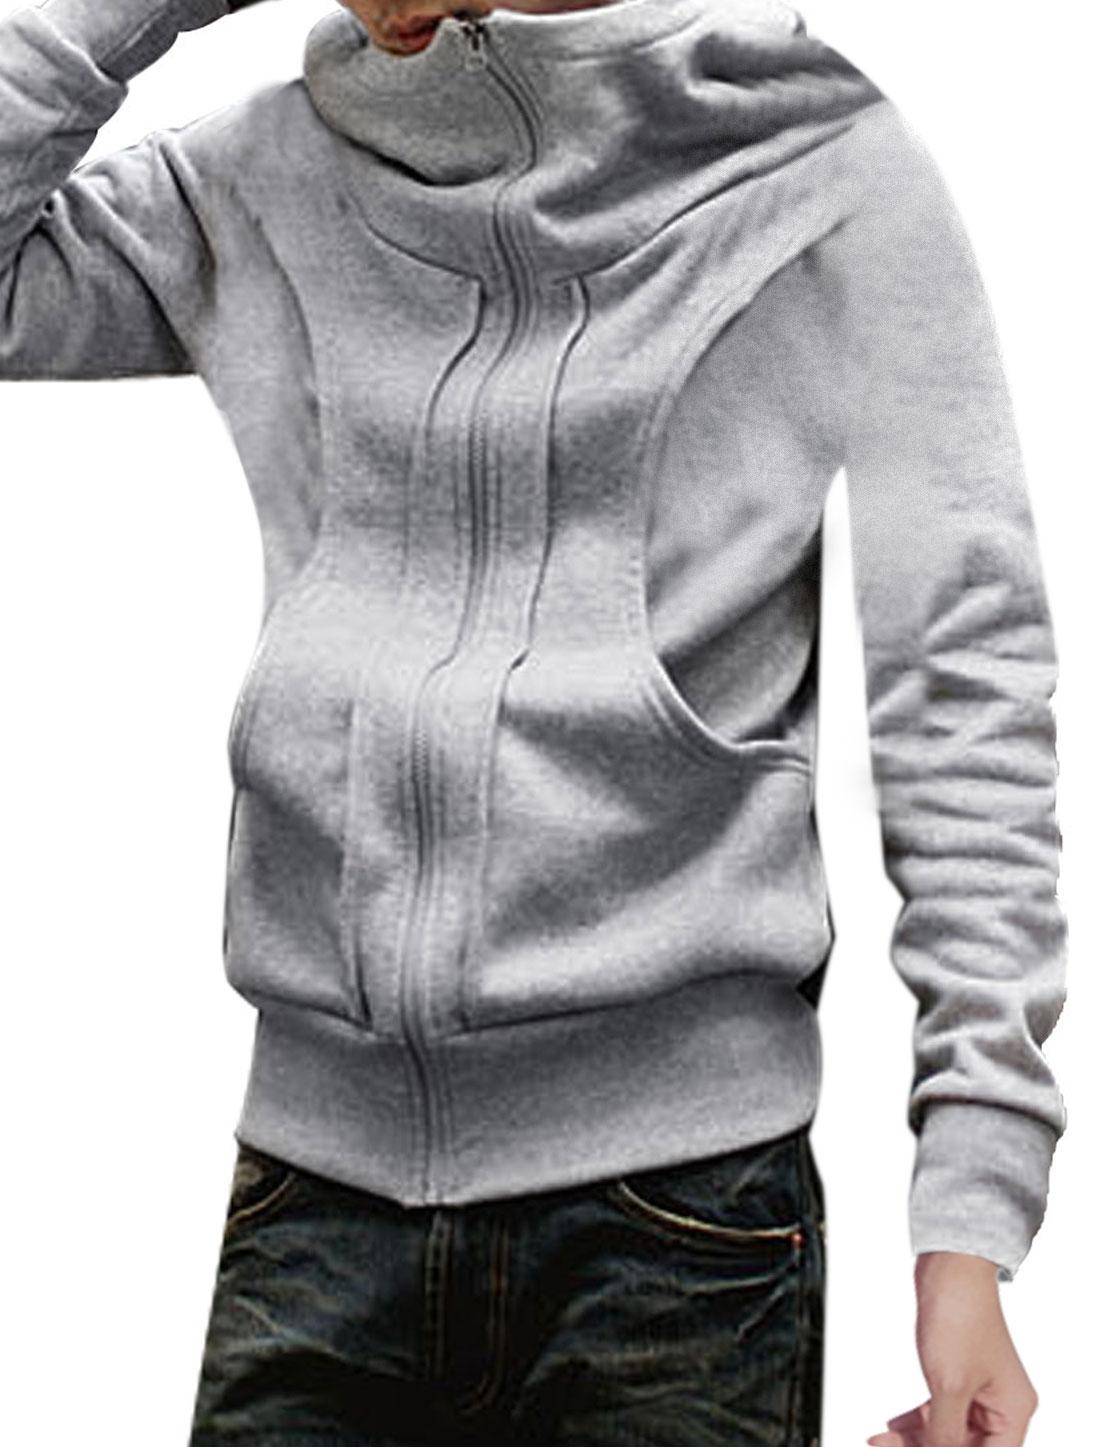 Mens Light Gray Side Pockets Ribbing Trim Casual Winter Hoodie M